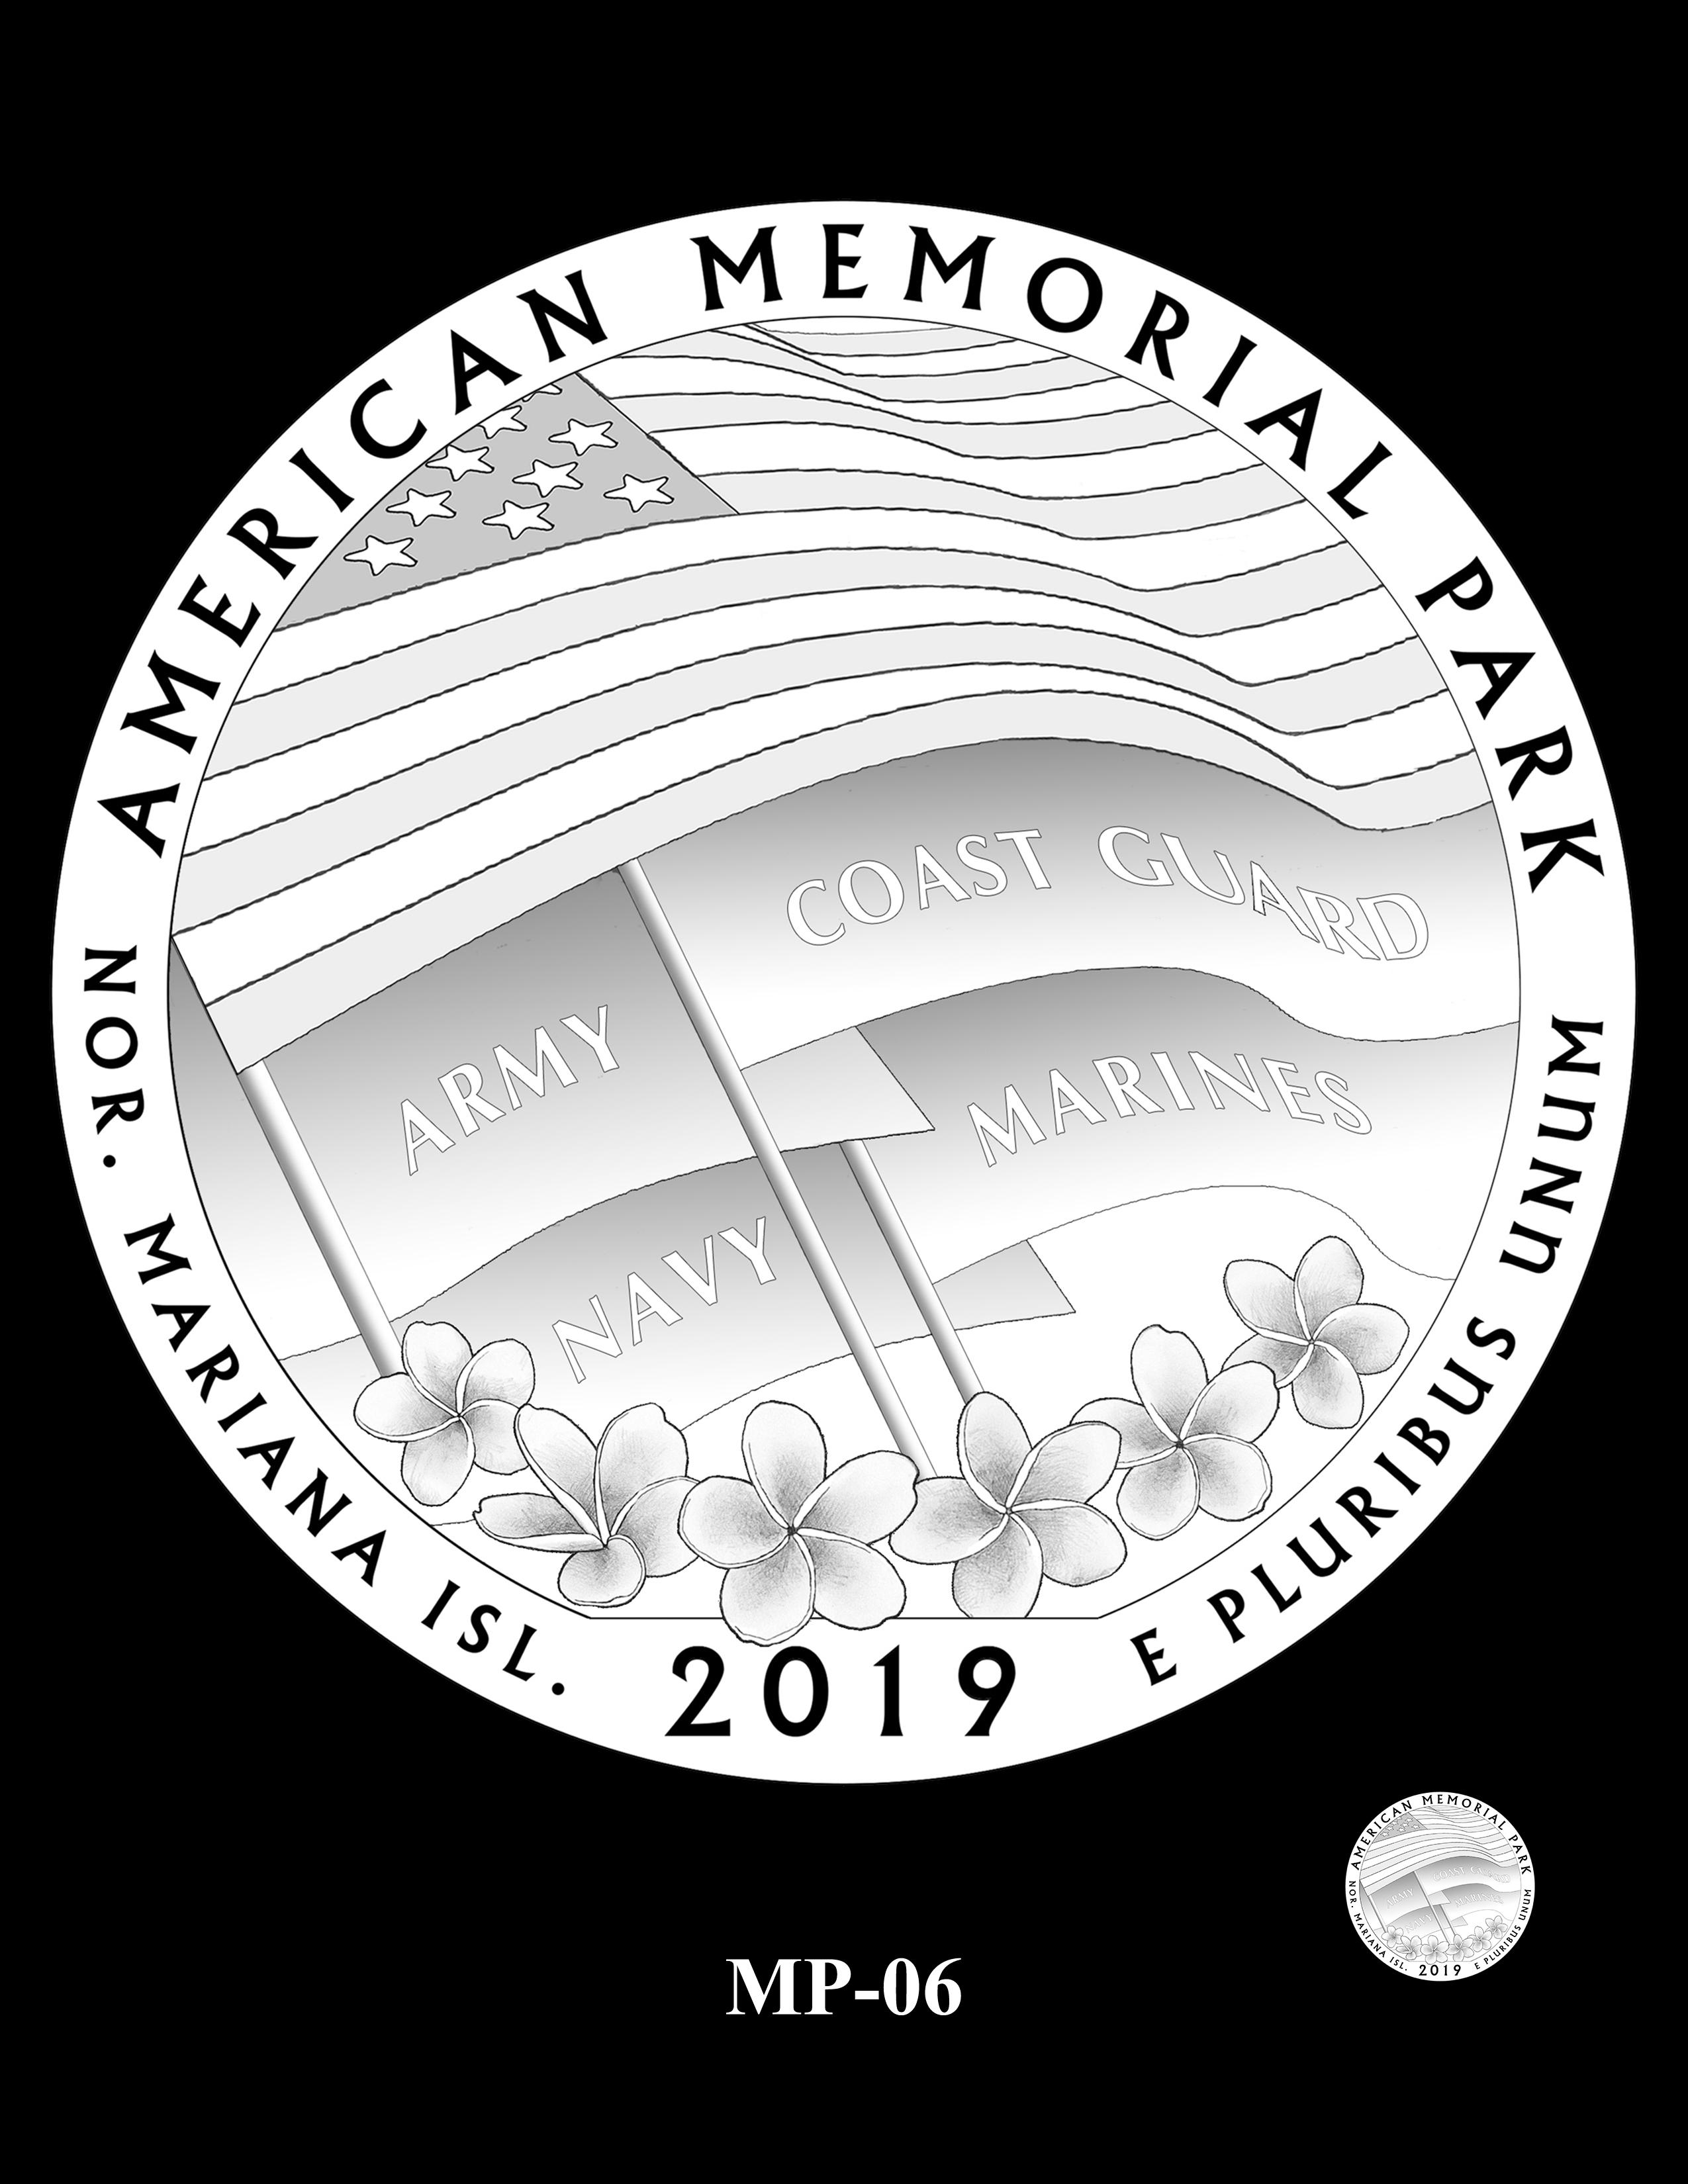 MP-06 -- 2019 America the Beautiful Quarters® Program